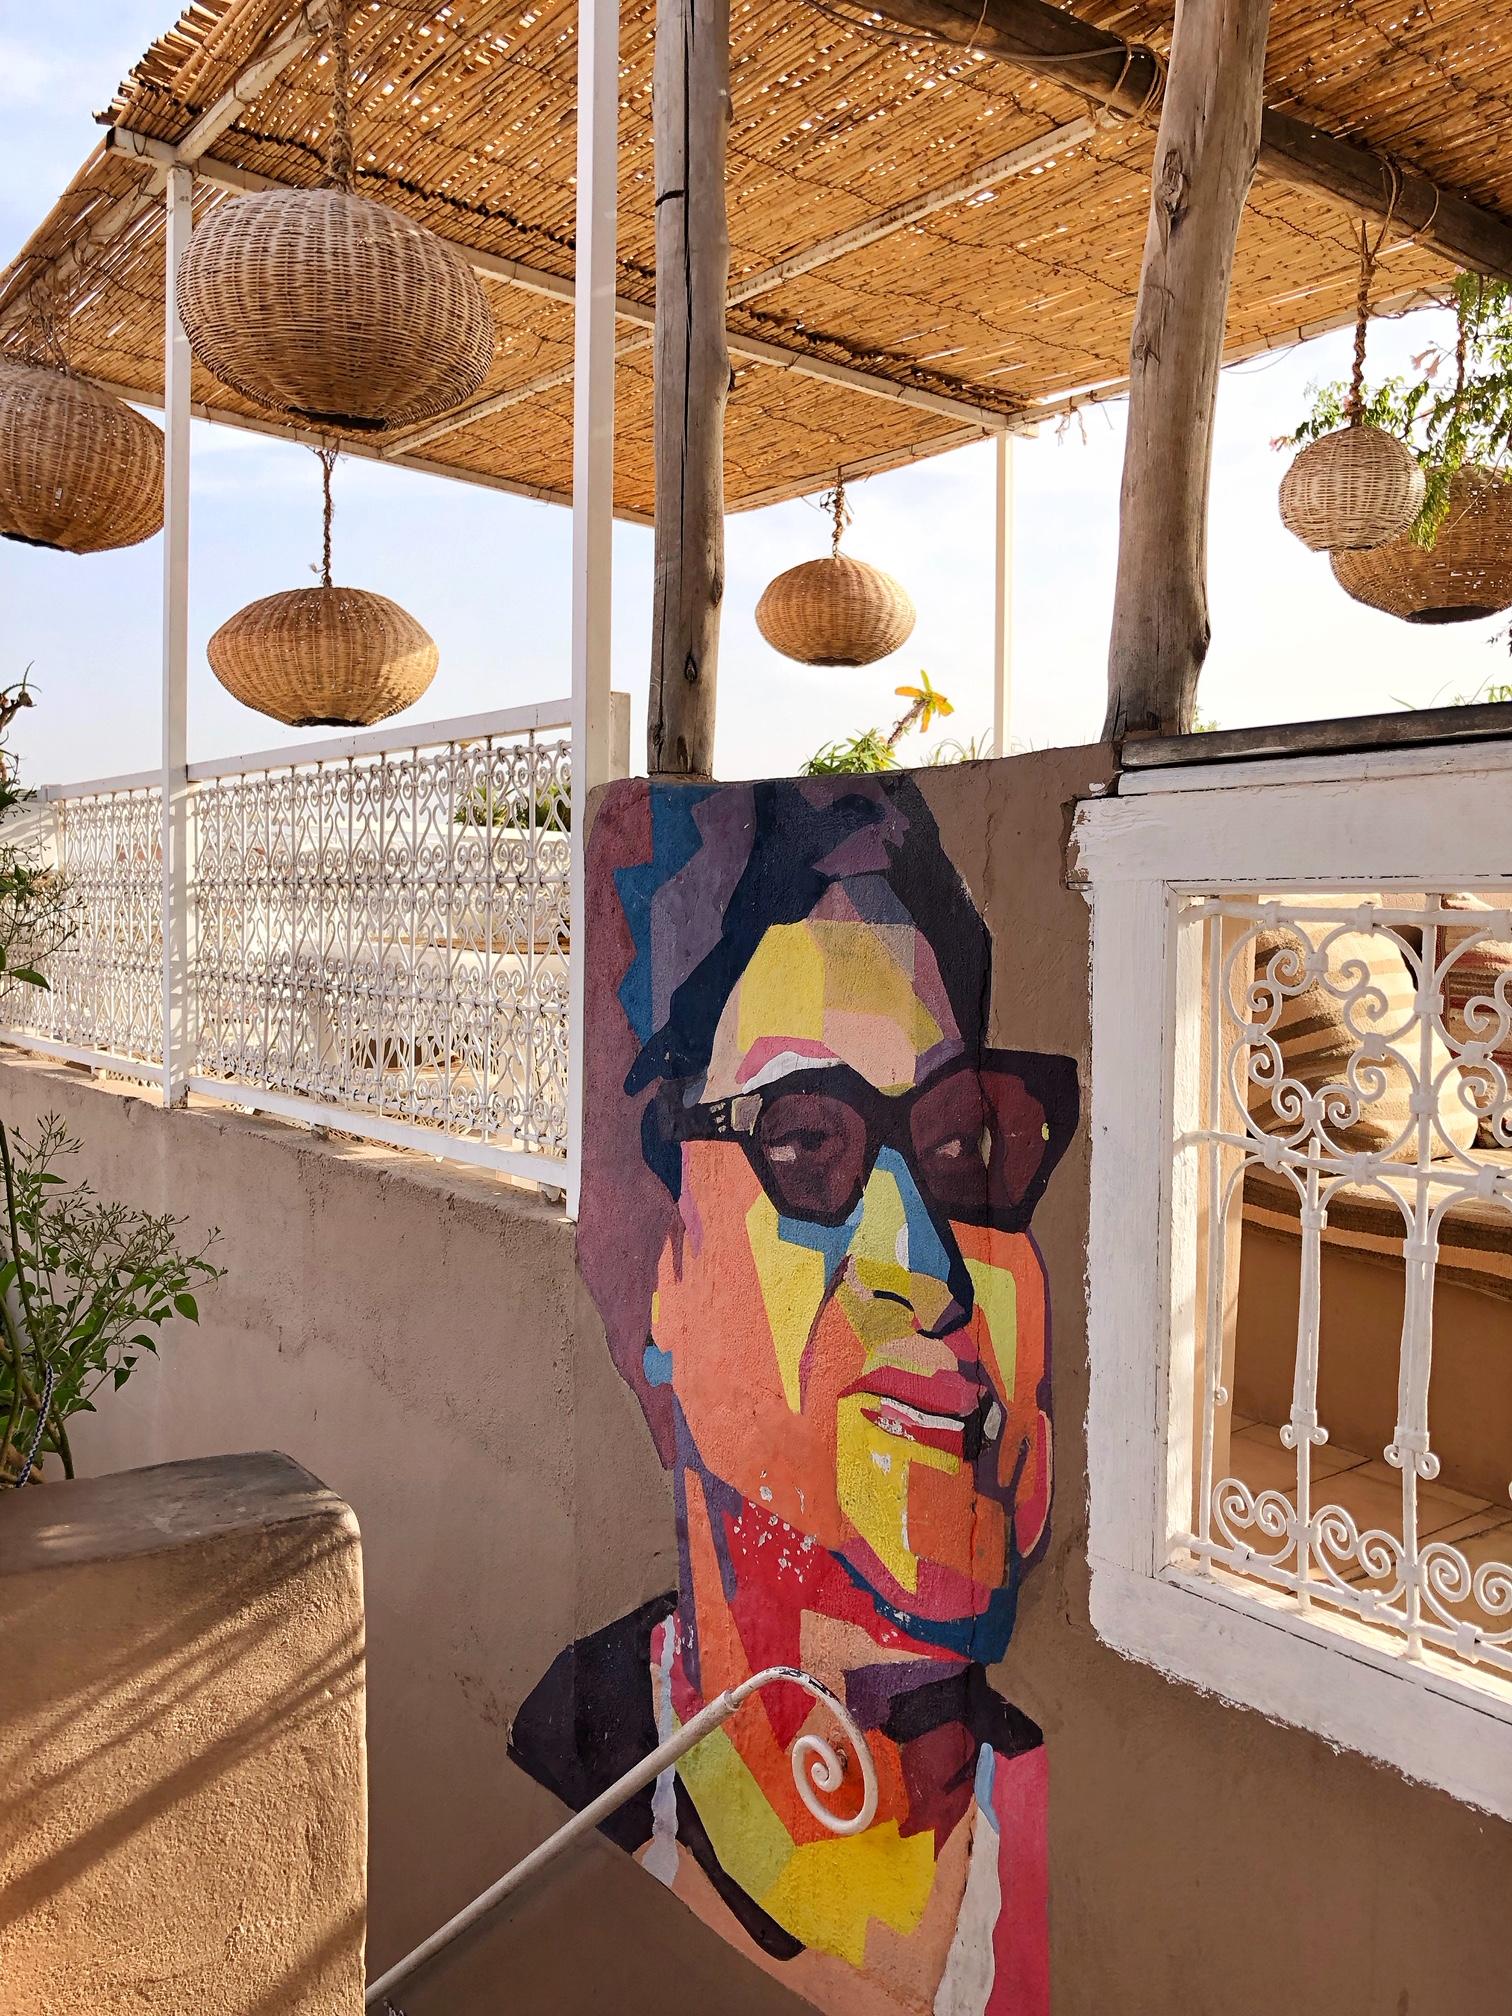 atay cafe, marrakech, the-alyst.com